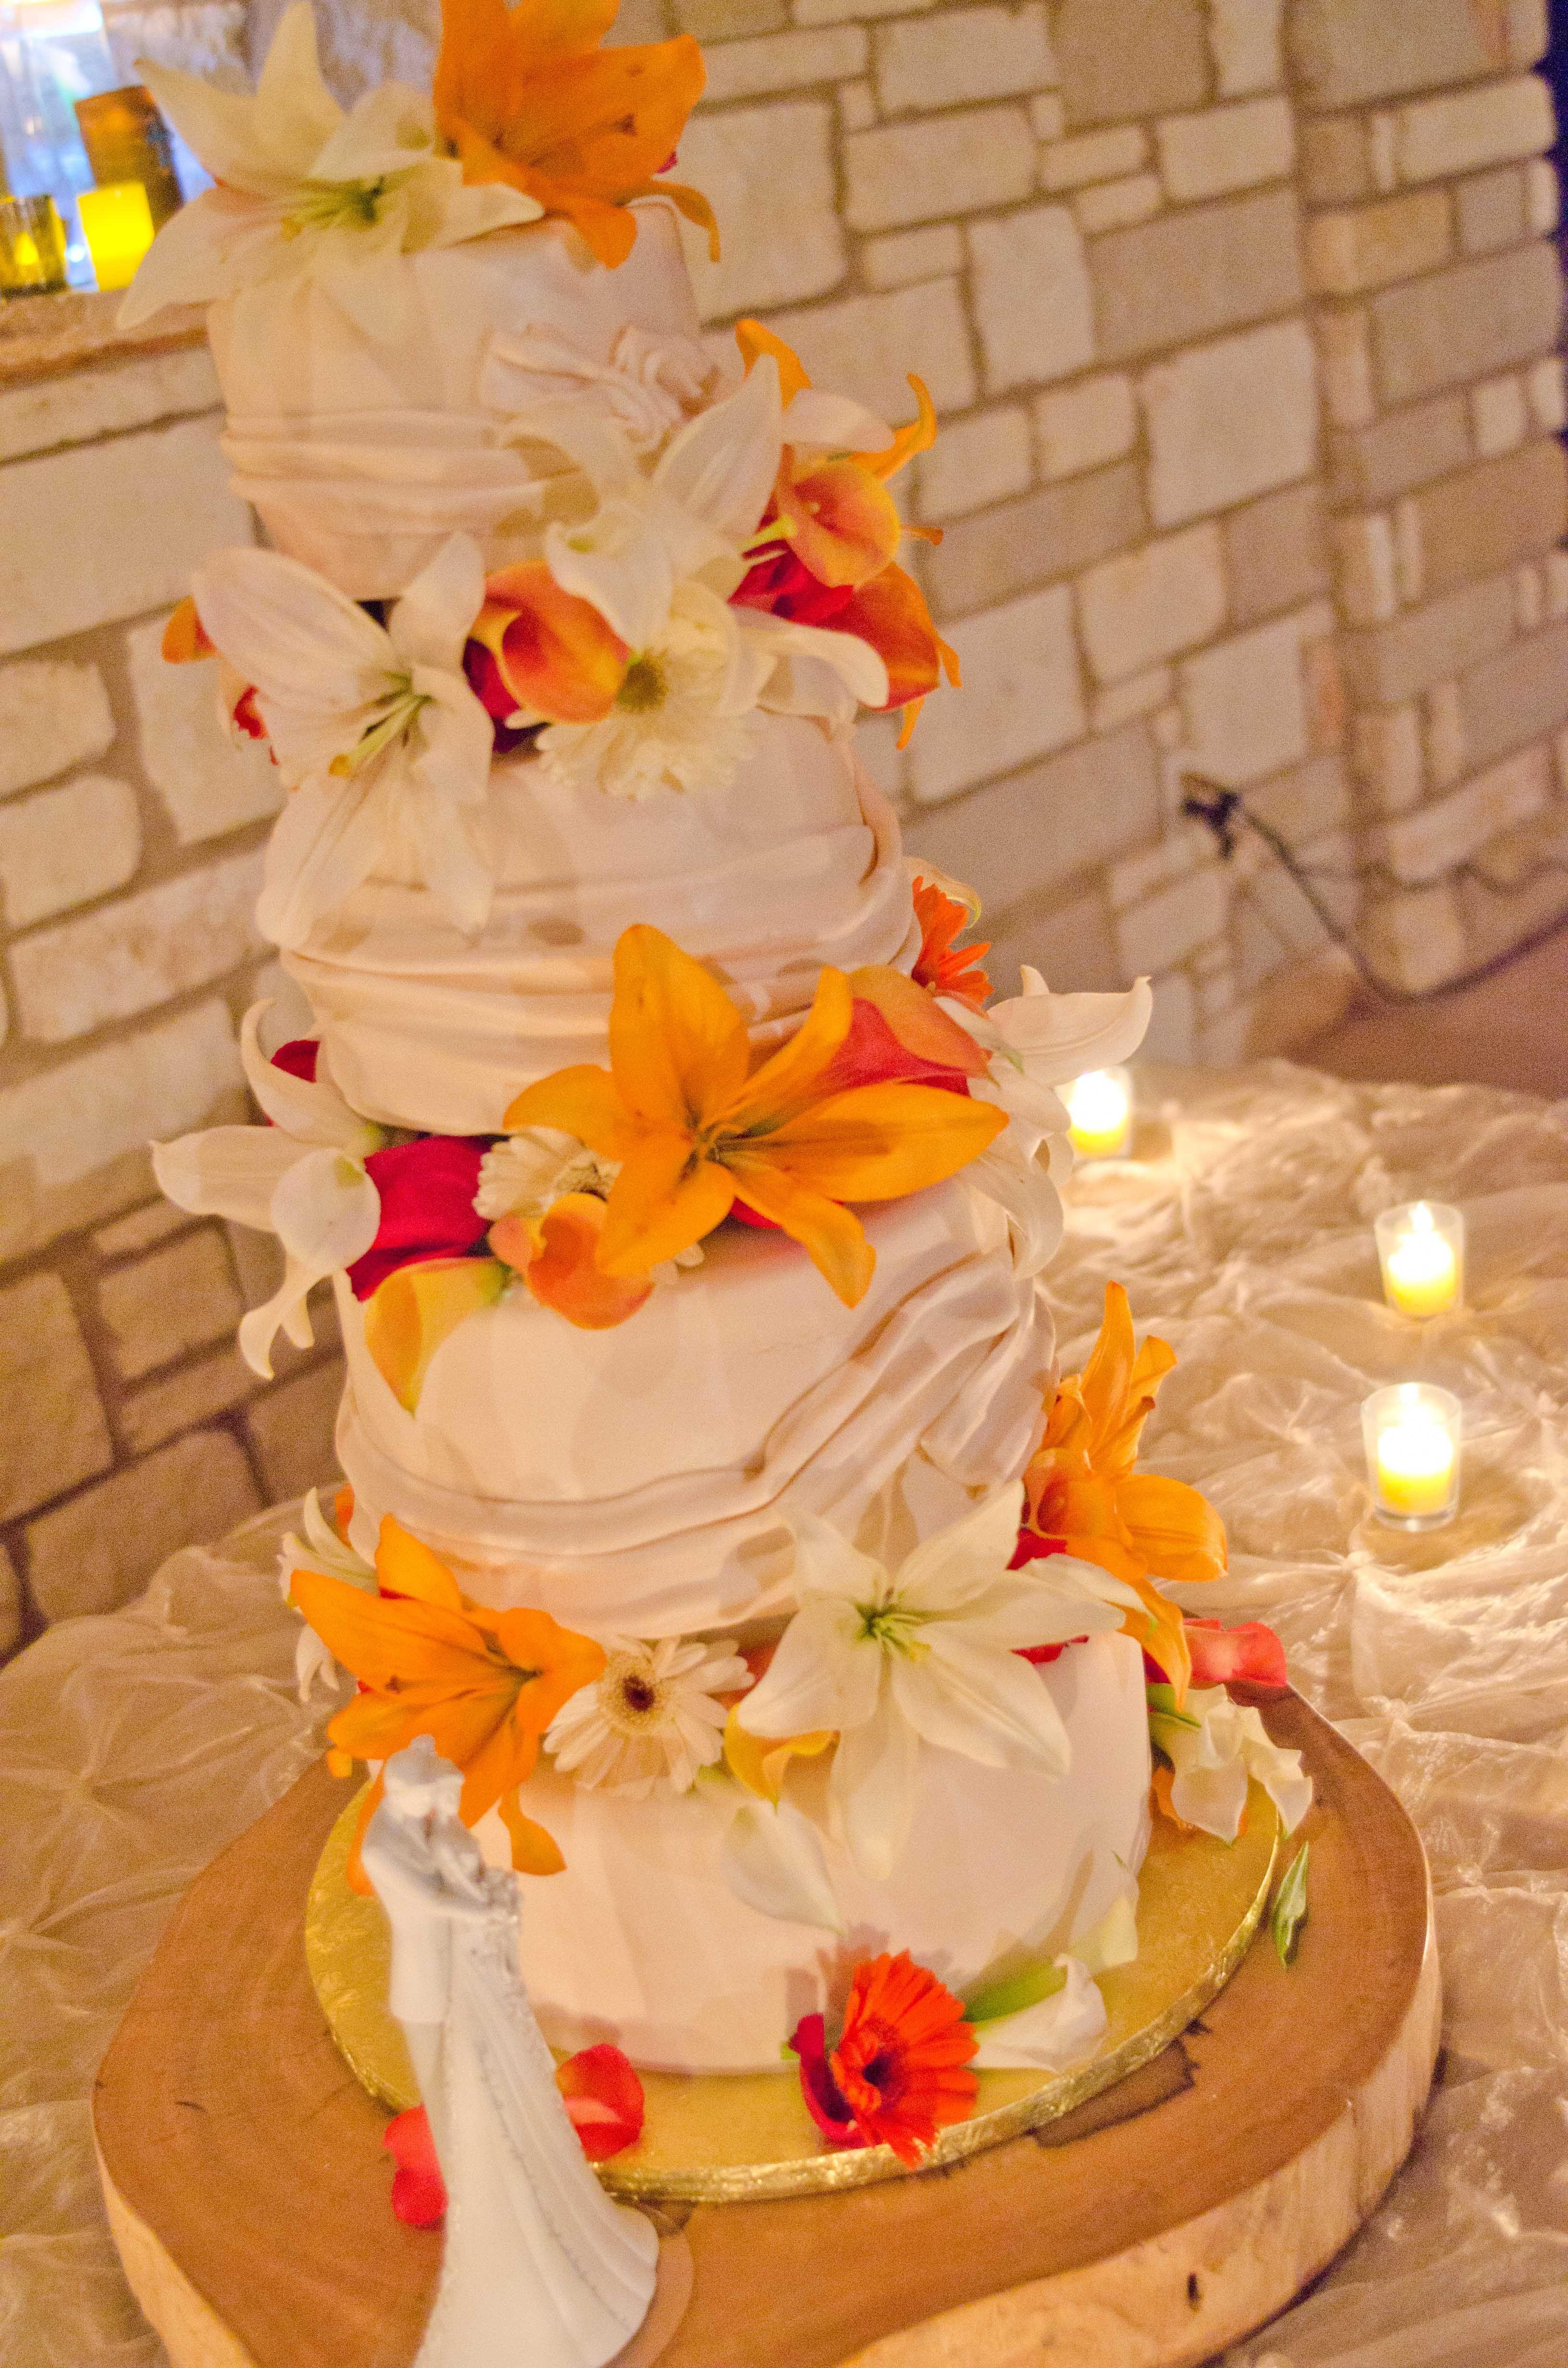 Hill country cakery cake bakery flower wedding